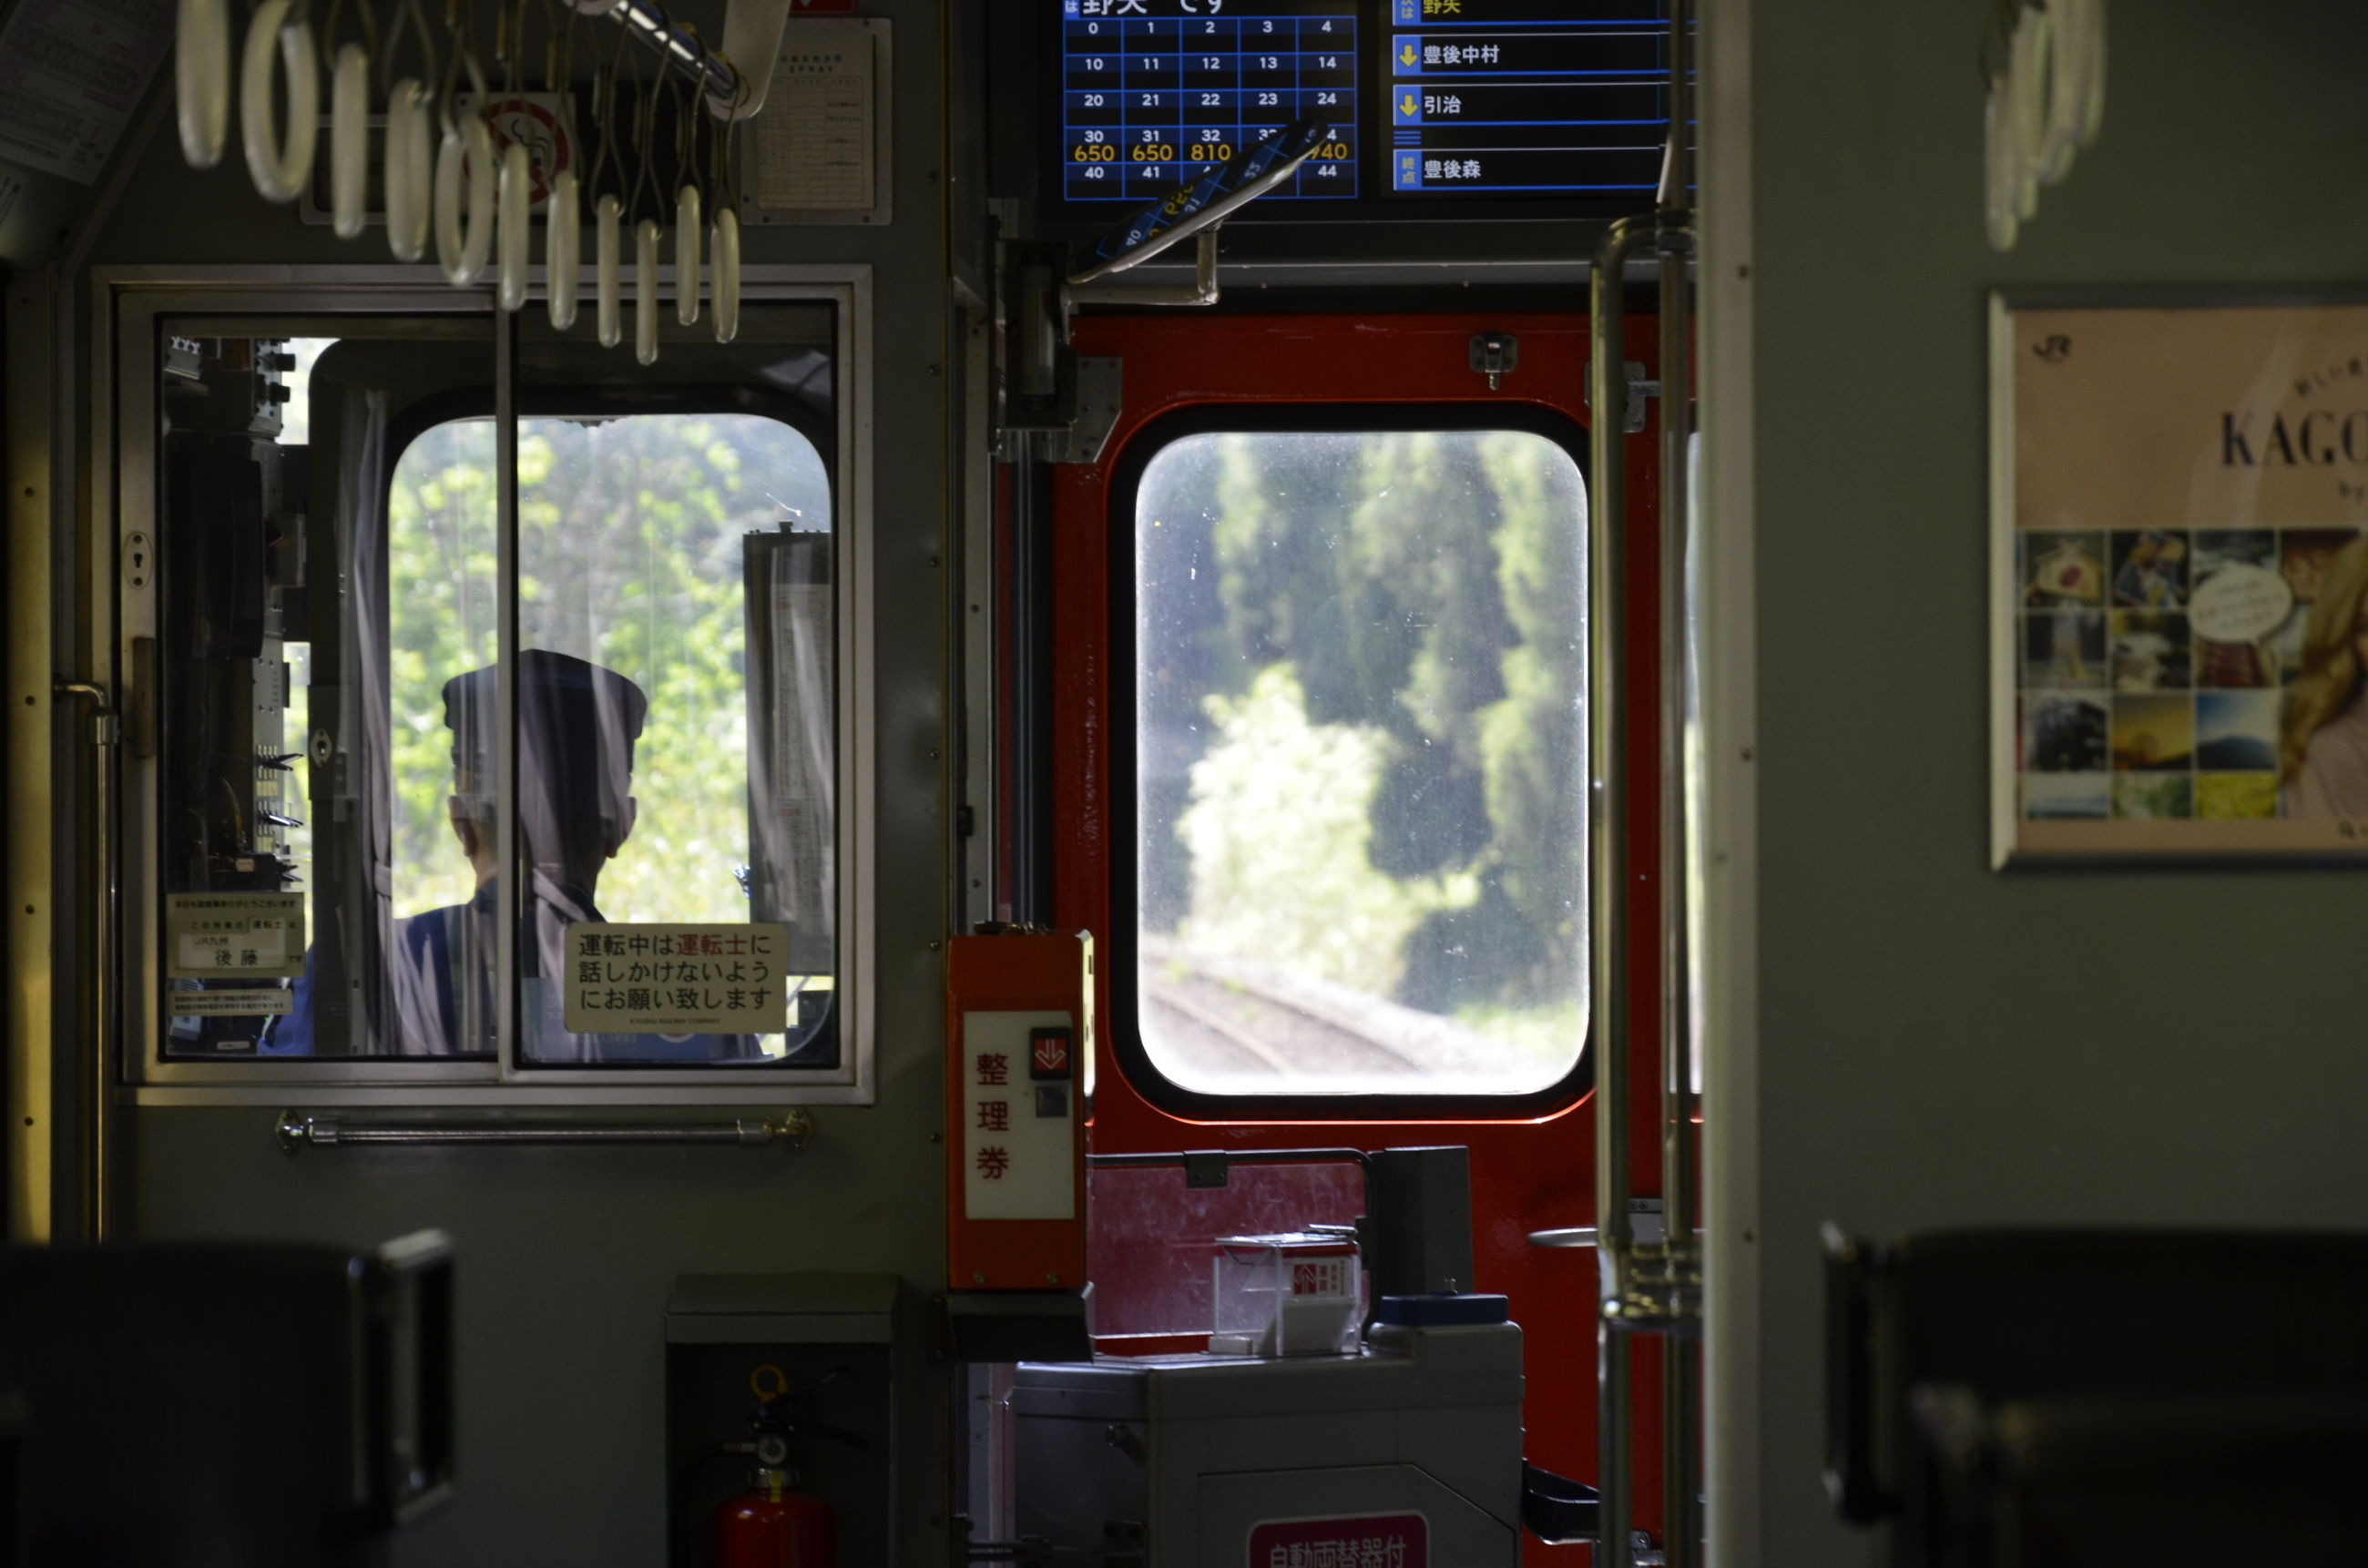 window, public transportation, transportation, glass - material, transparent, travel, mode of transport, journey, day, interior, sky, cloud - sky